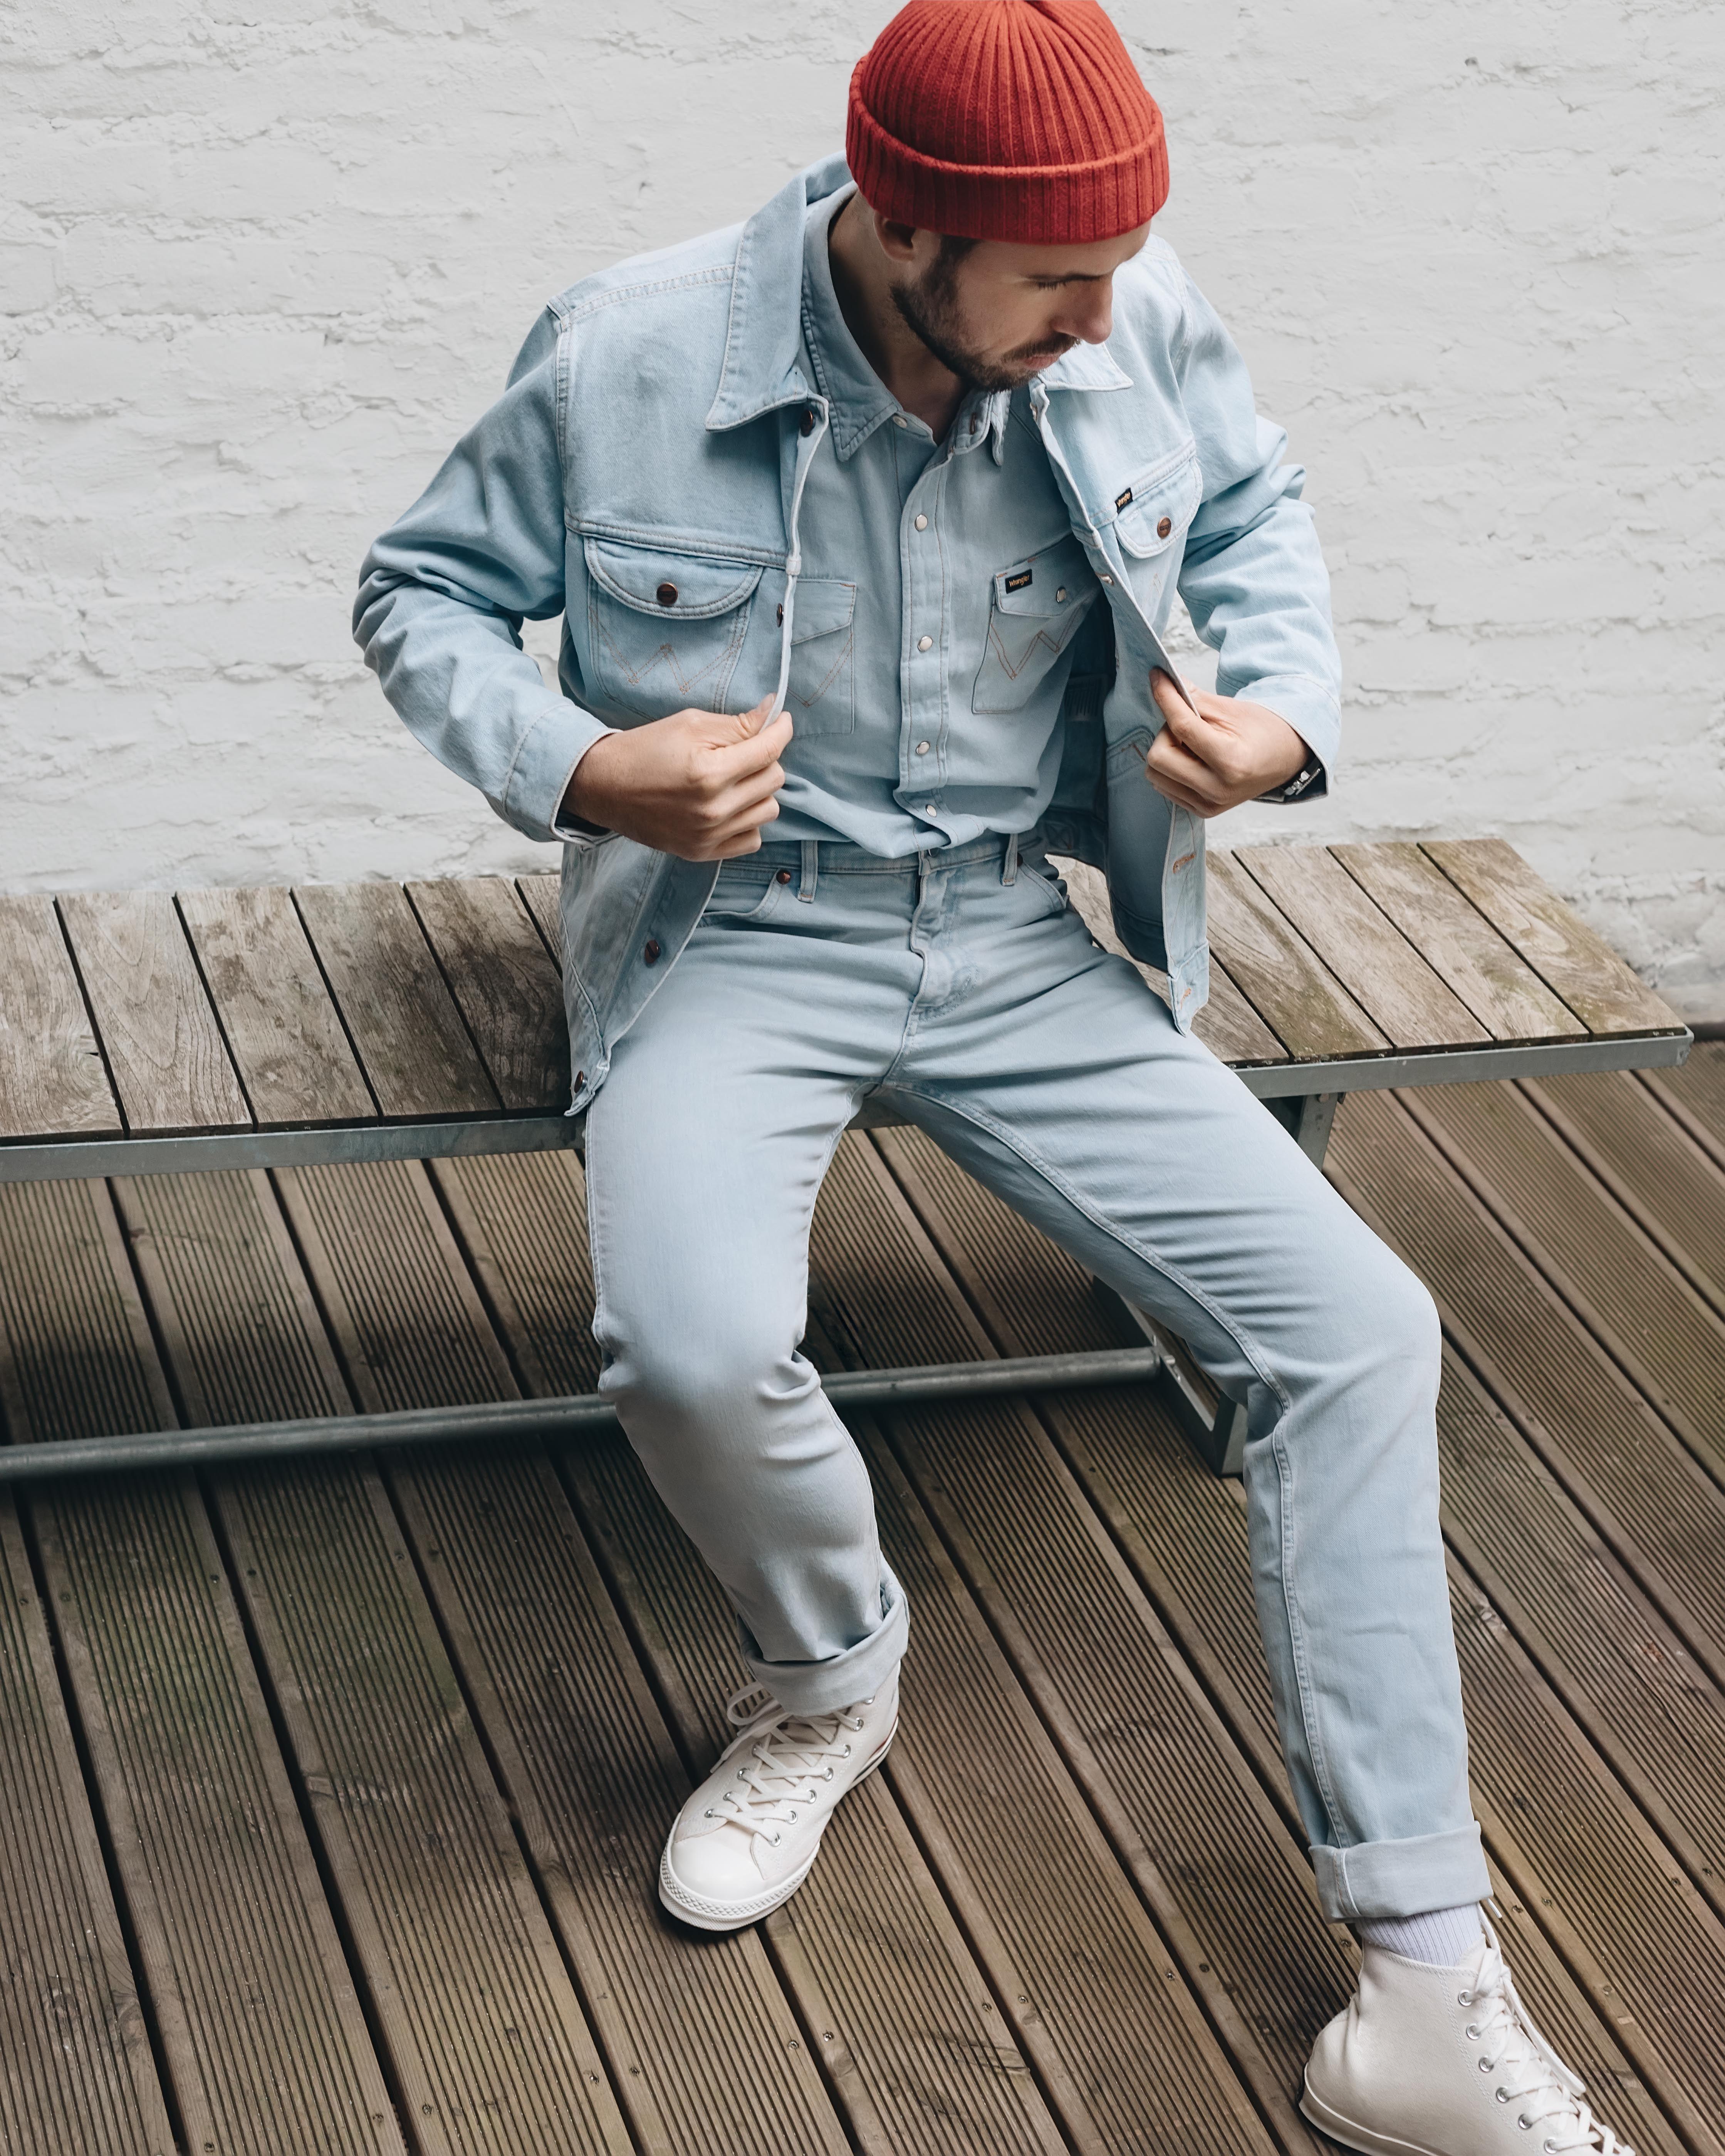 Wrangler Icons 124mj Men S Denim Jacket Men S Jackets Outerwear Wrangler Denim Jacket Fashion Denim Jacket Men Hiking Outfit [ 5598 x 4478 Pixel ]